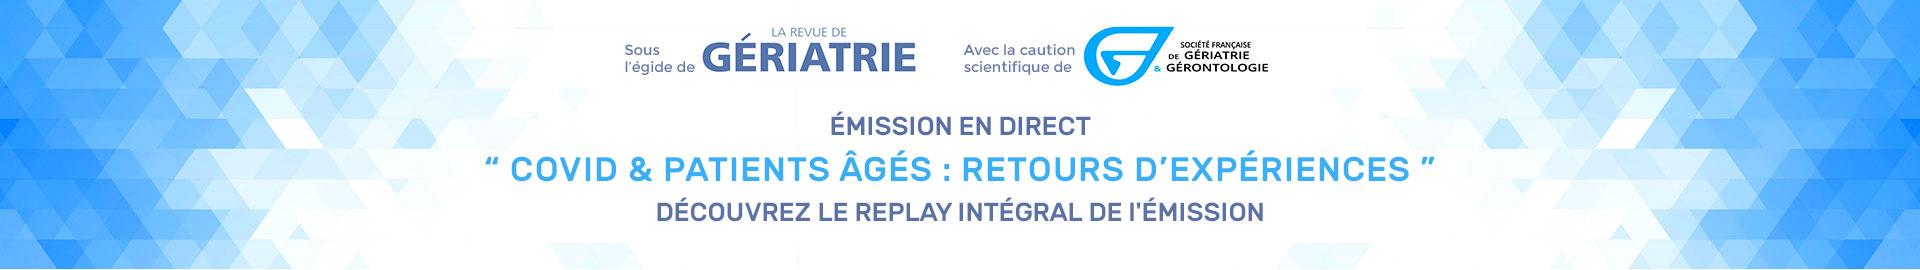 slider_revue_geriatrie_avec_texte